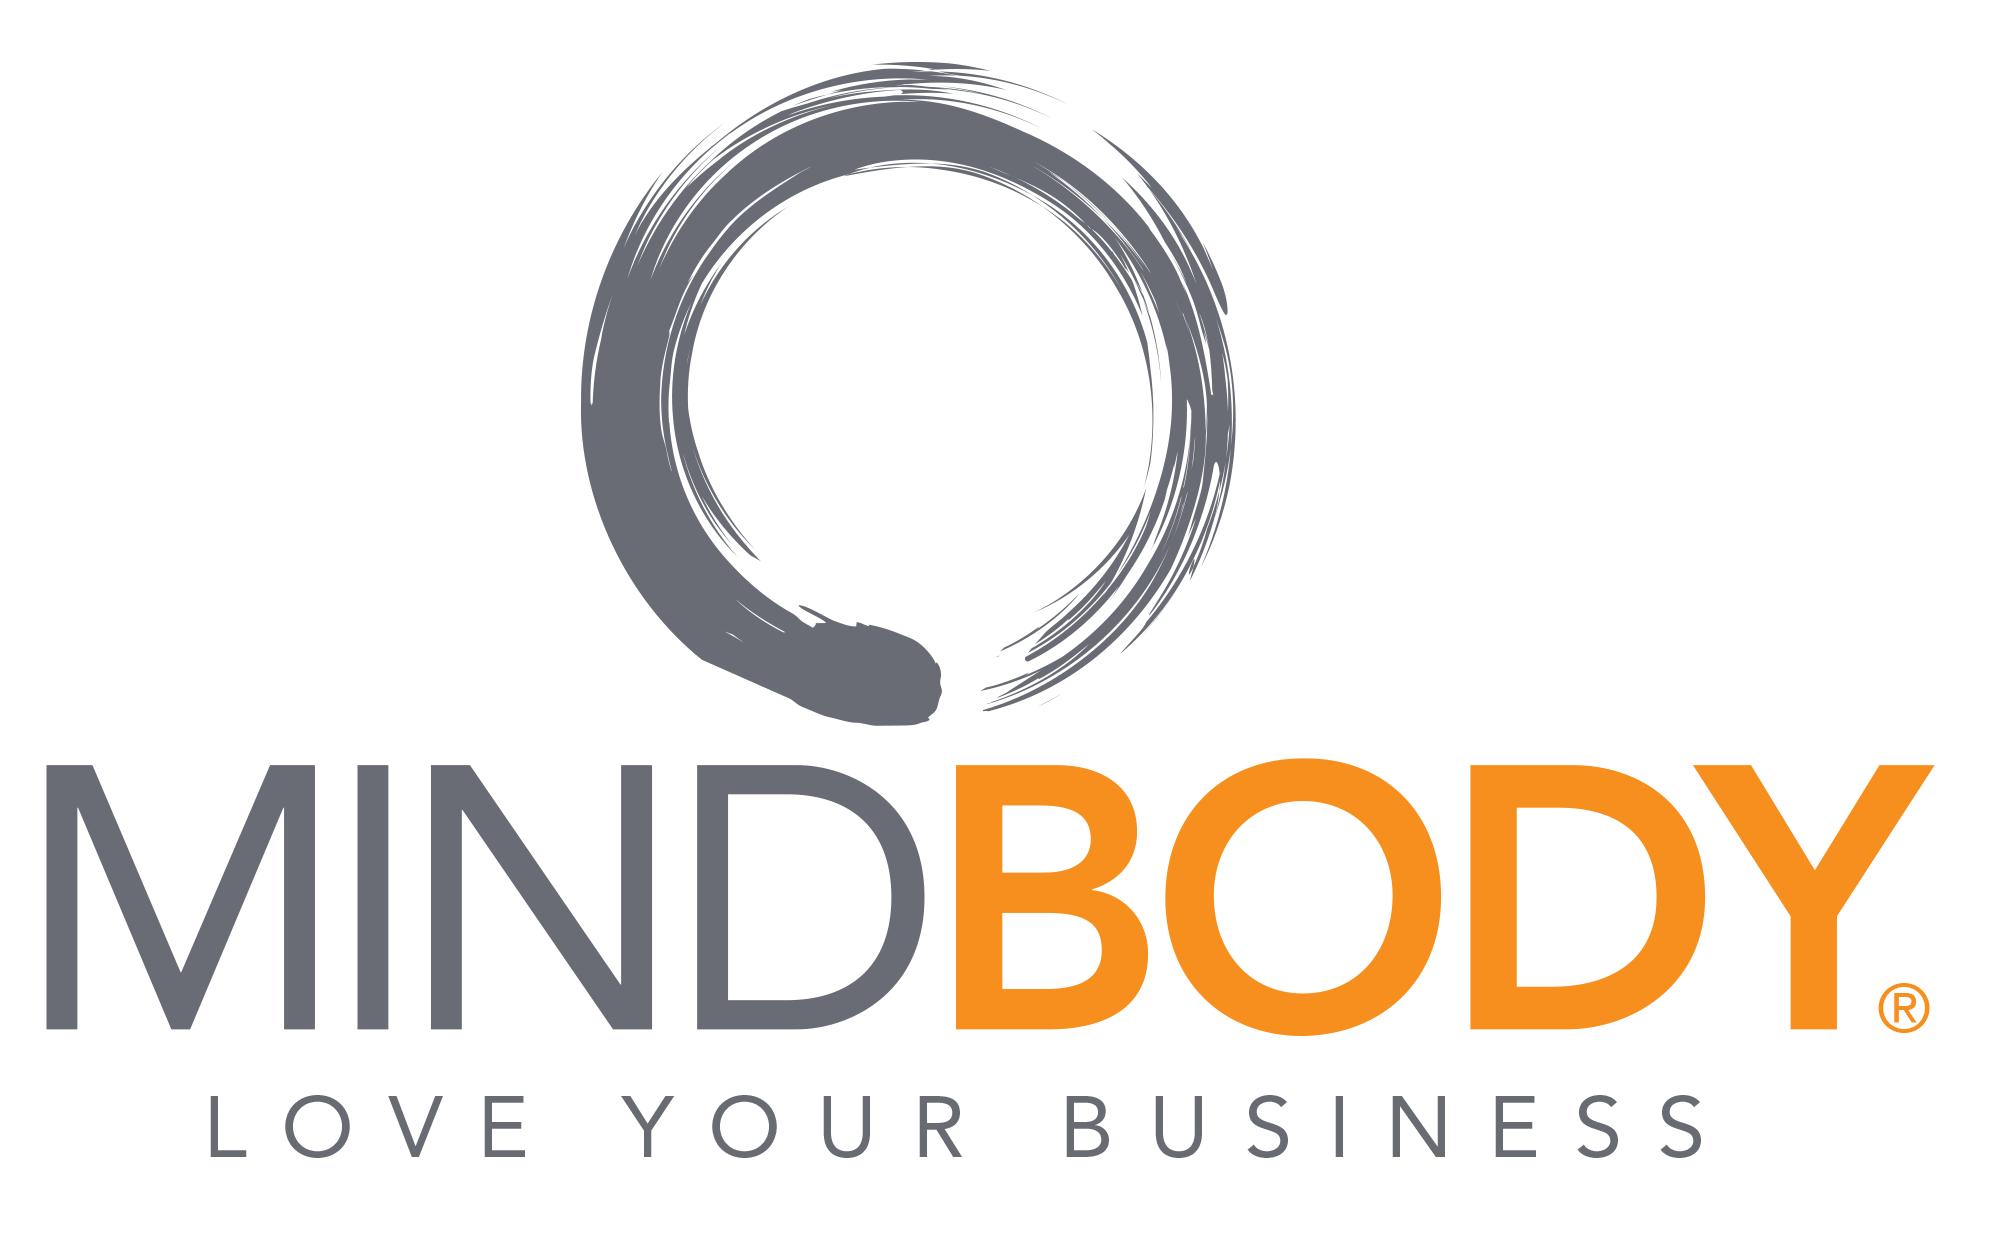 MINDBODY-company-logo-1.png